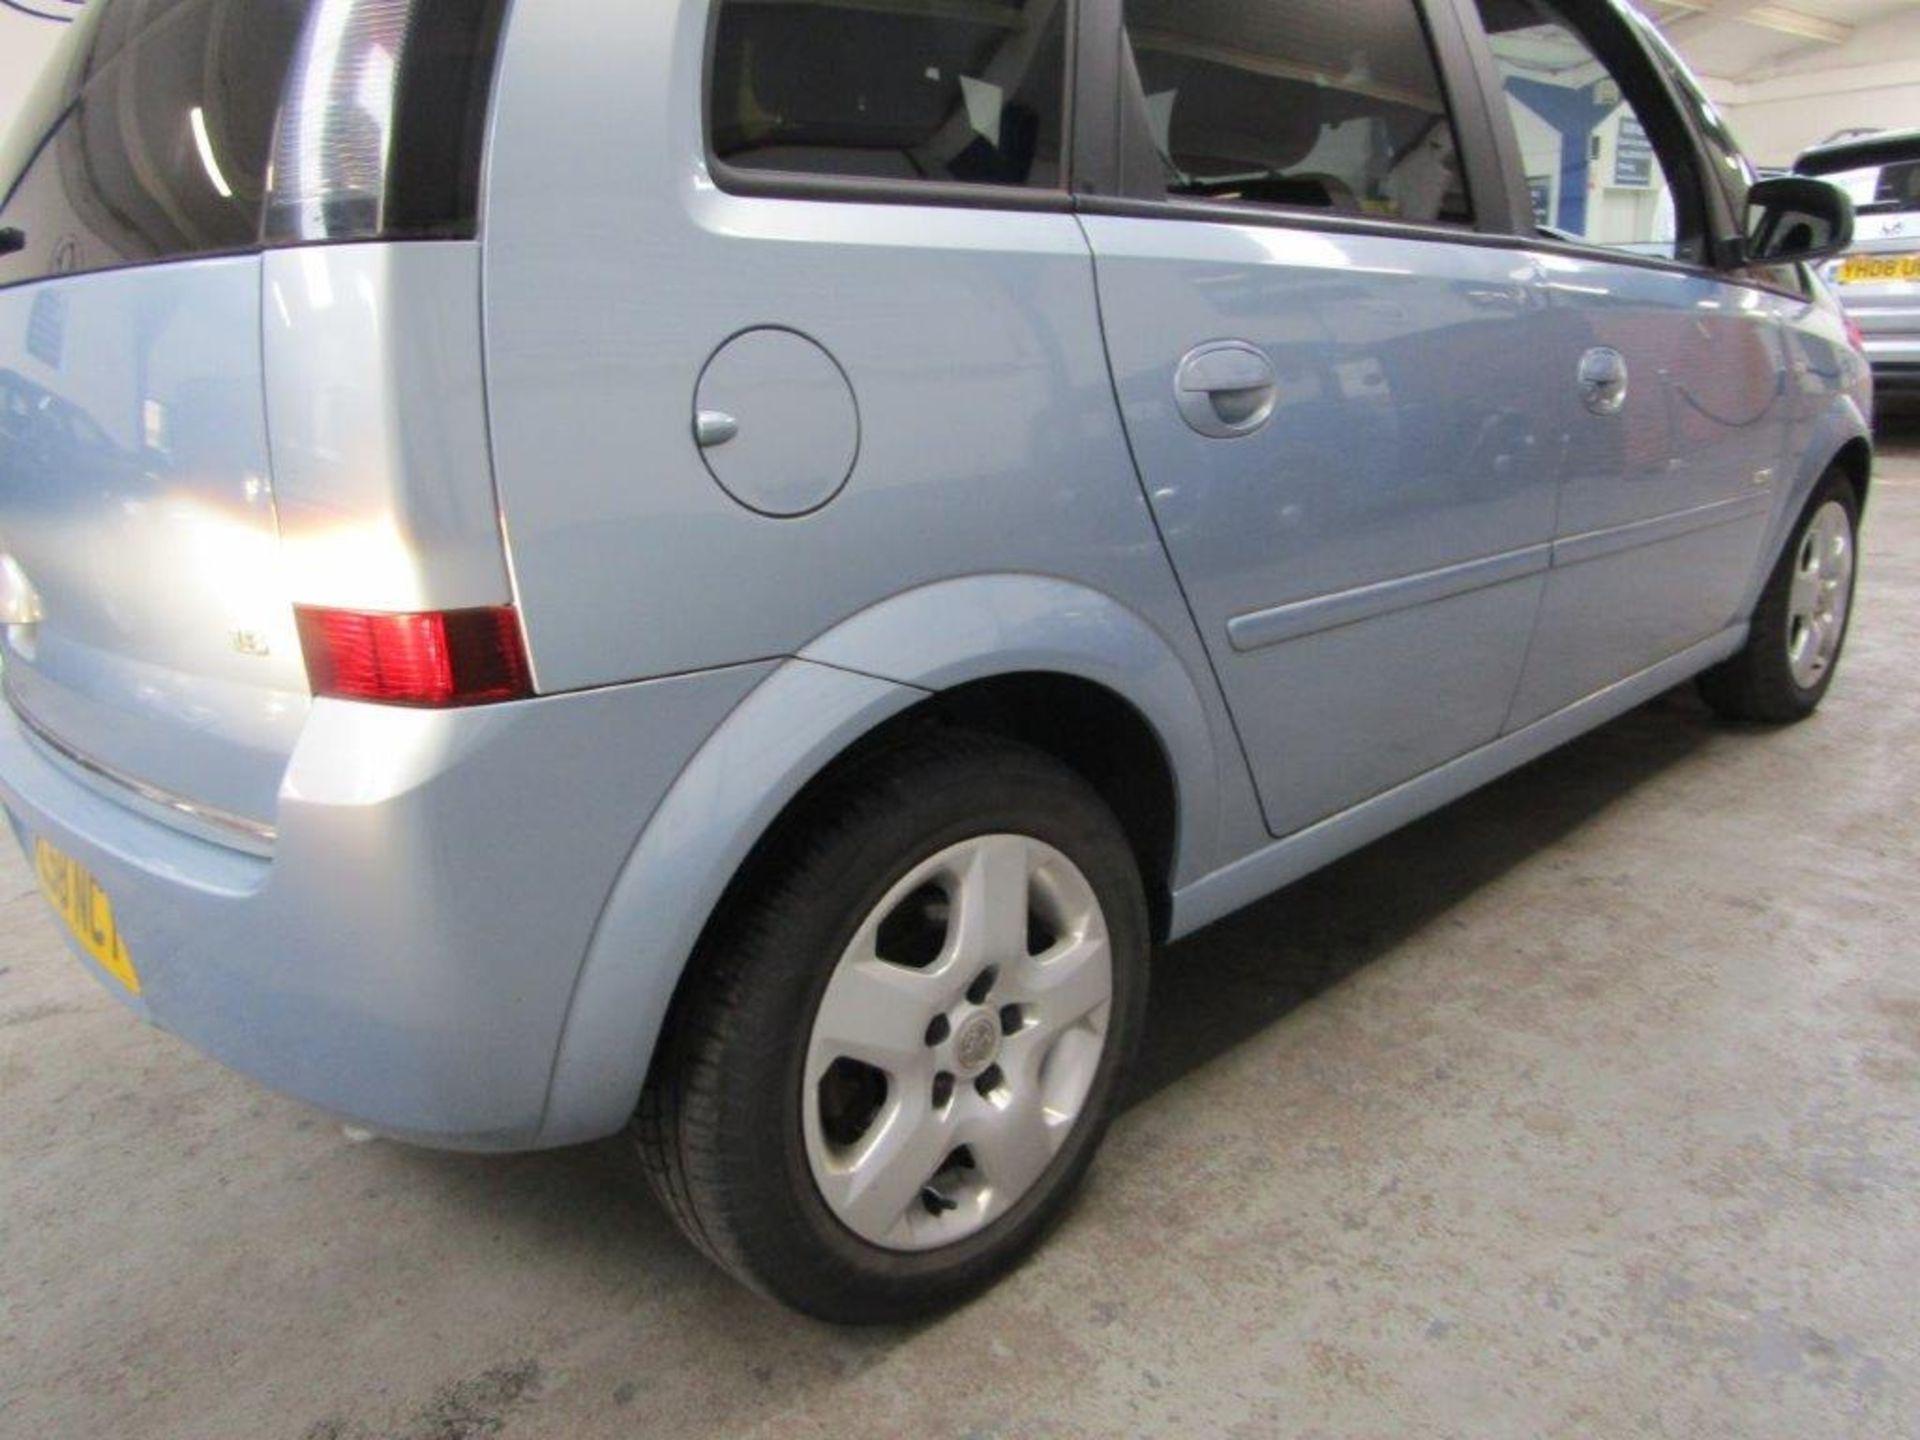 58 08 Vauxhall Meriva Design - Image 21 of 25